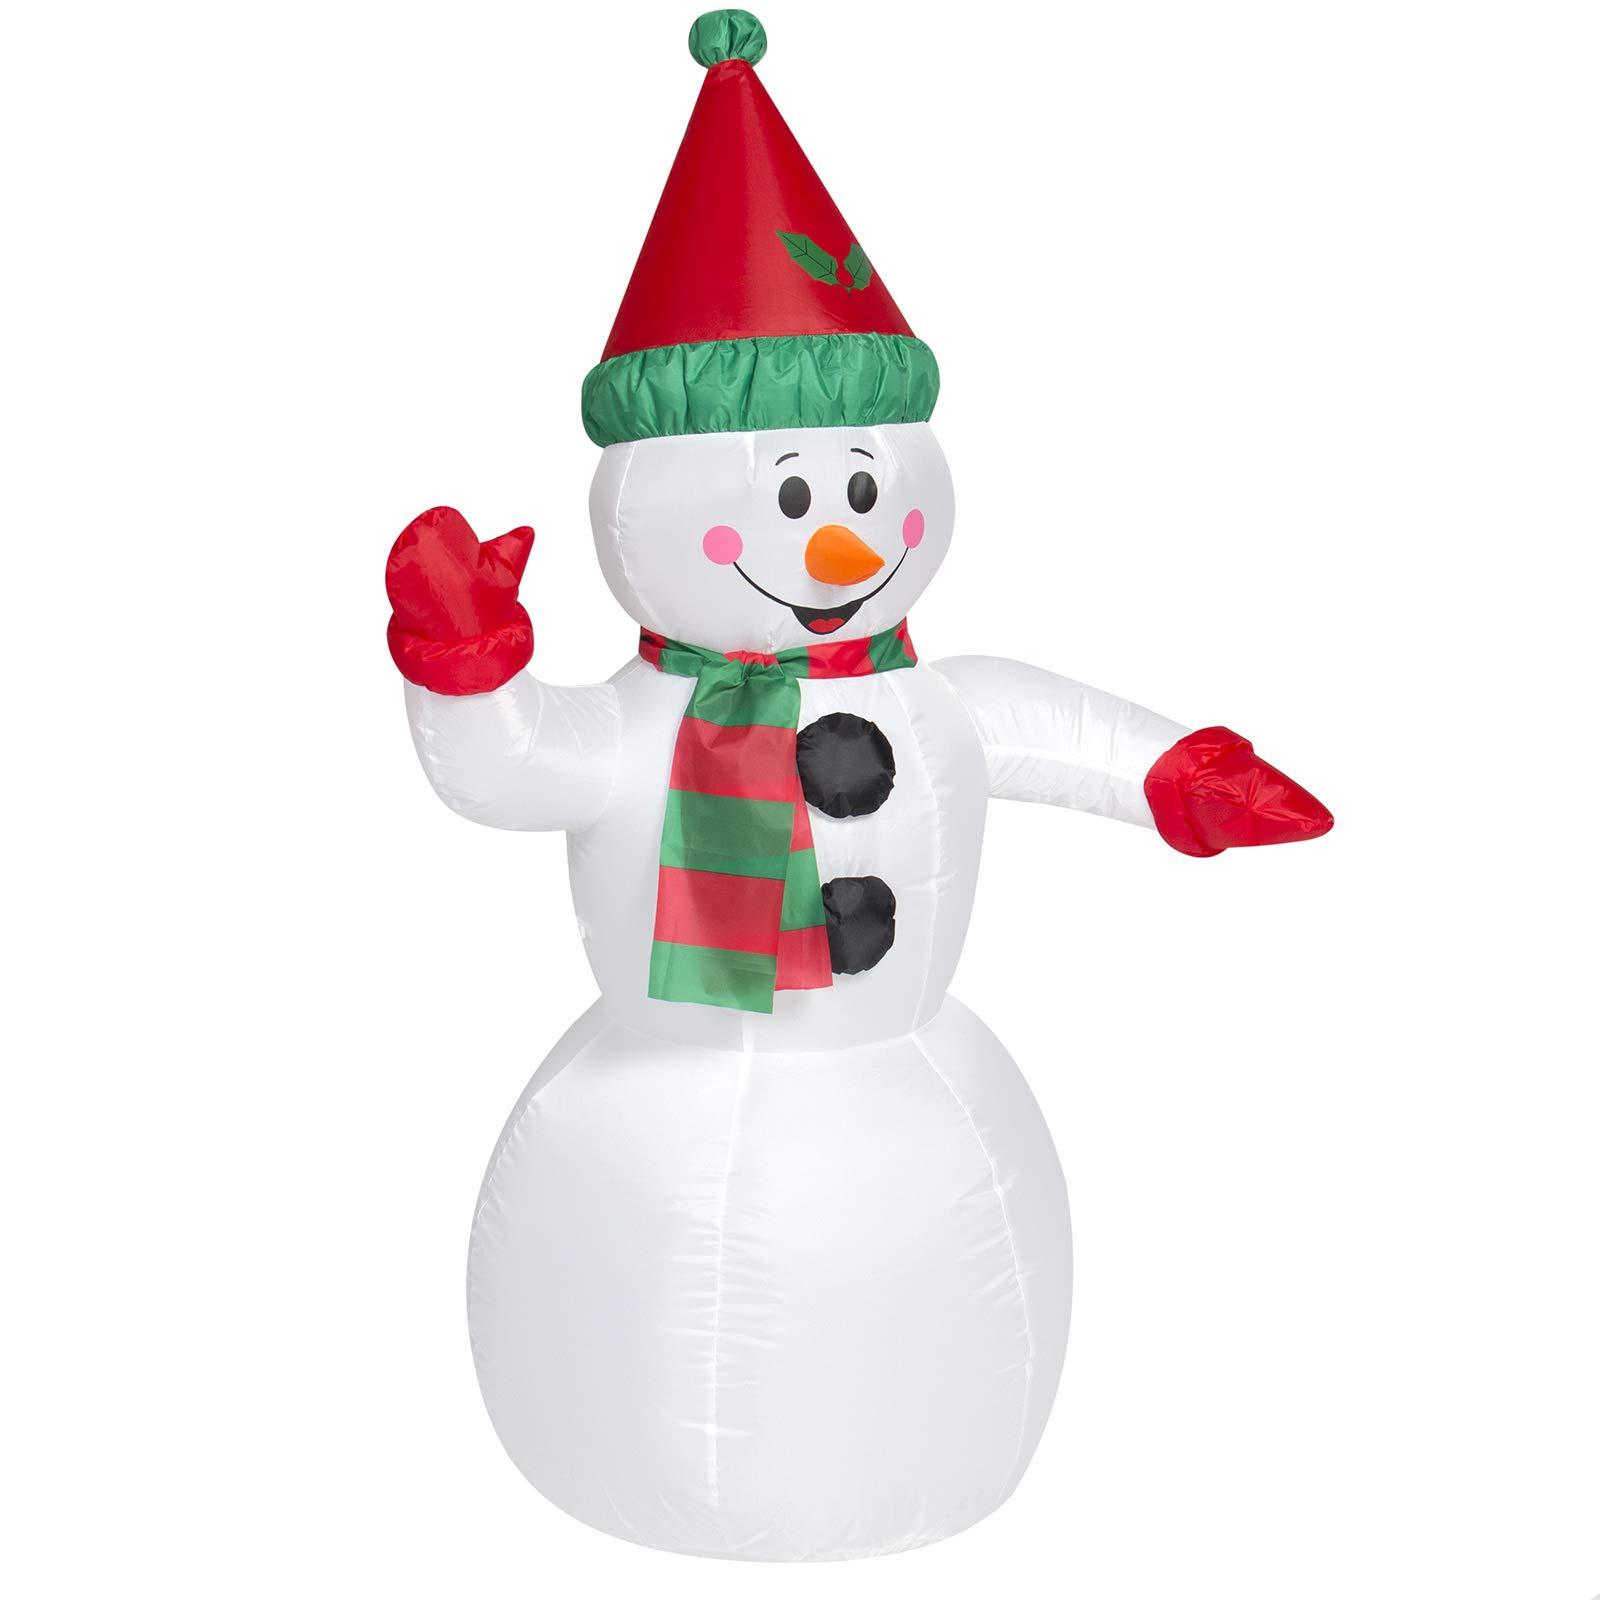 Best Choice Products Seasonal Decorative Prelit Inflatable Snowman W/Fan Blower